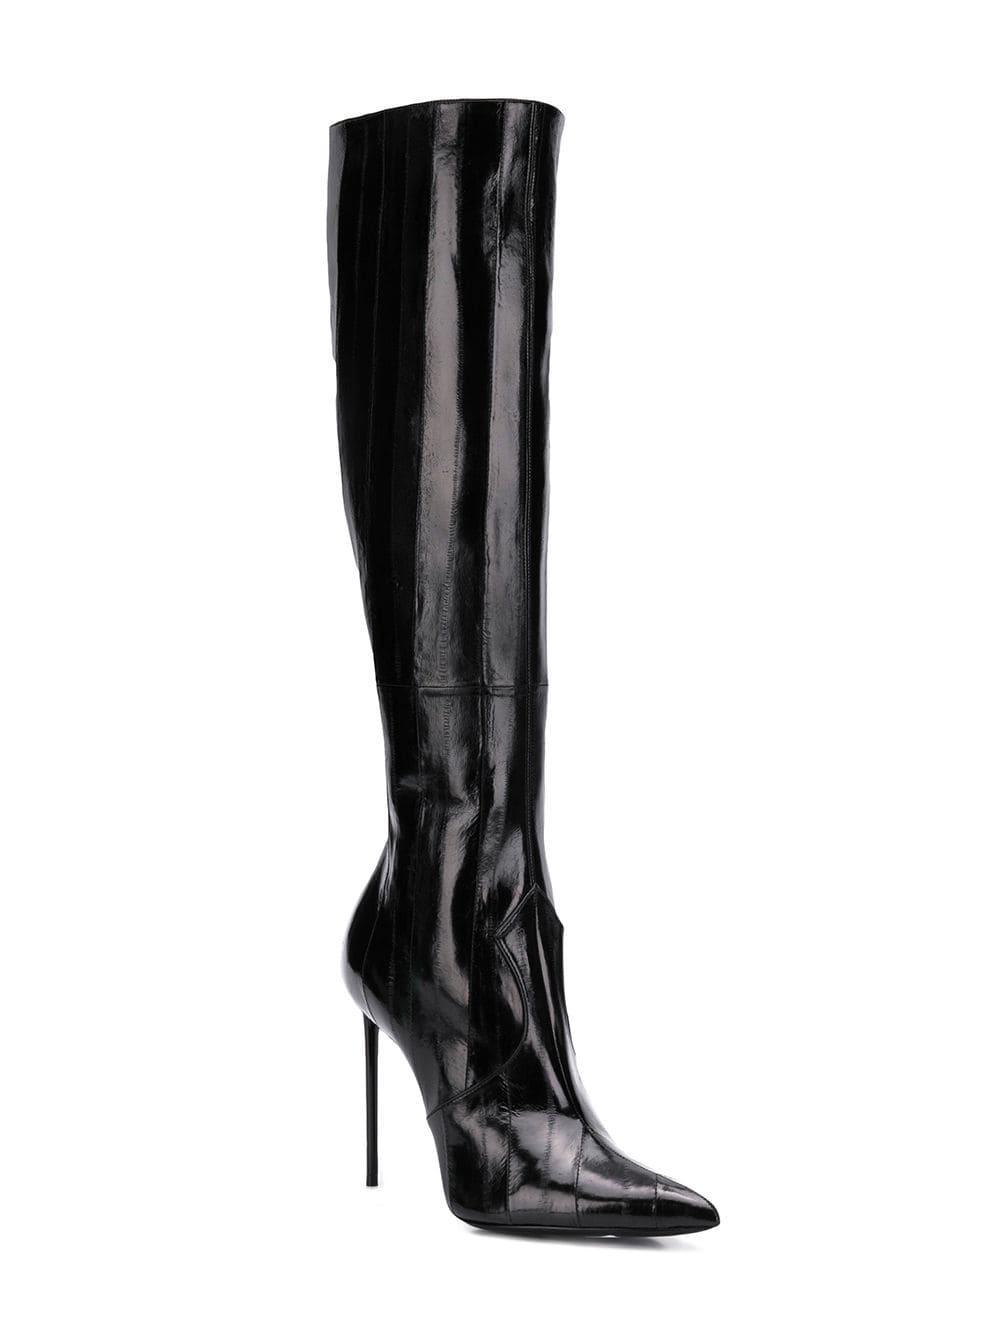 9e657fbce6e Saint Laurent Heeled Knee High Boots in Black - Lyst